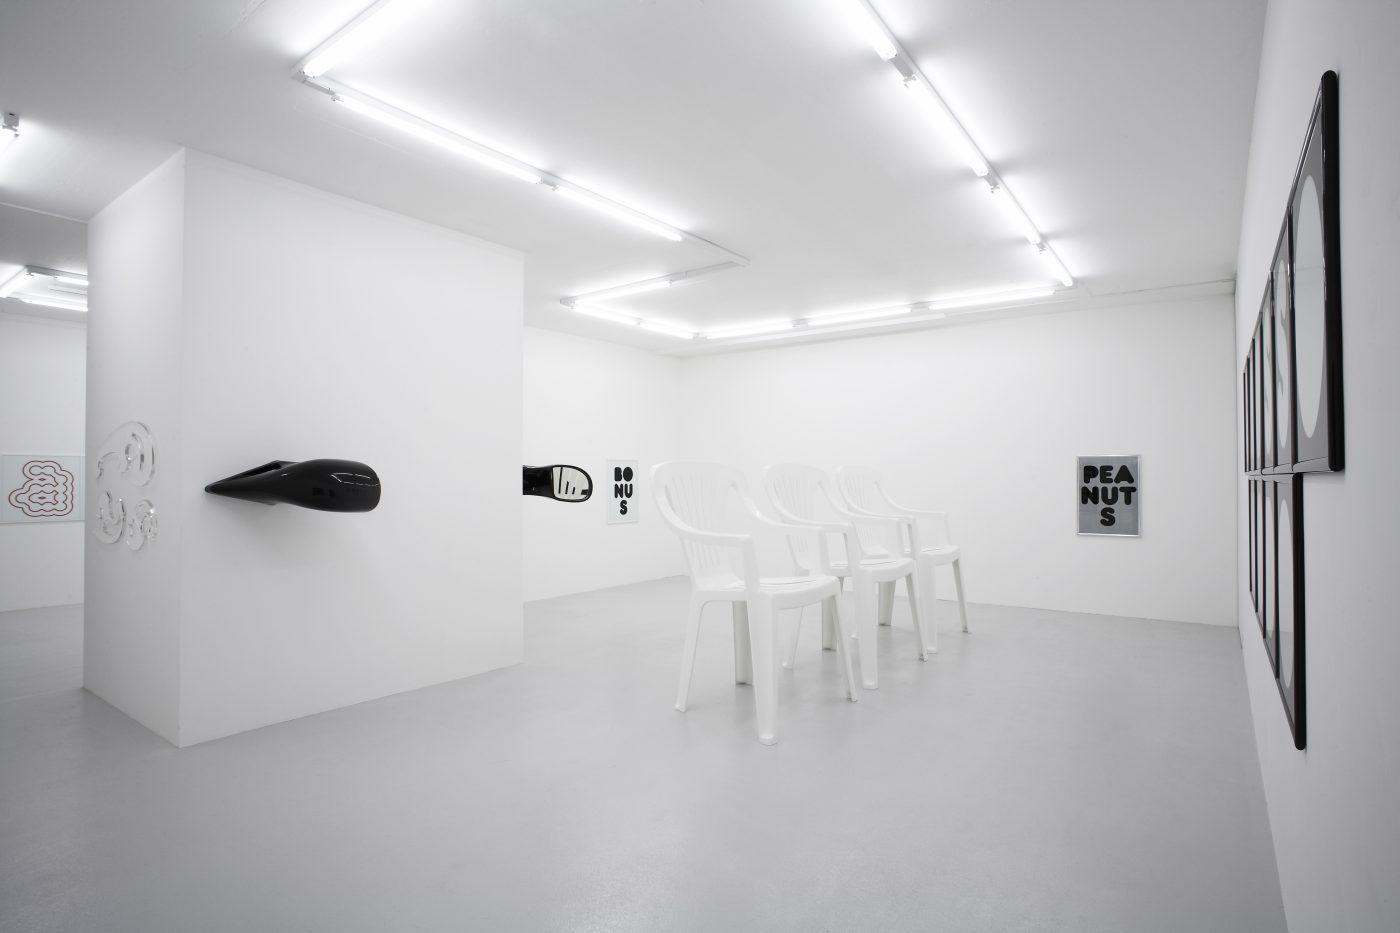 Galerie Lange + Pult – Lilian Bourgeat / Christian Robert-Tissot